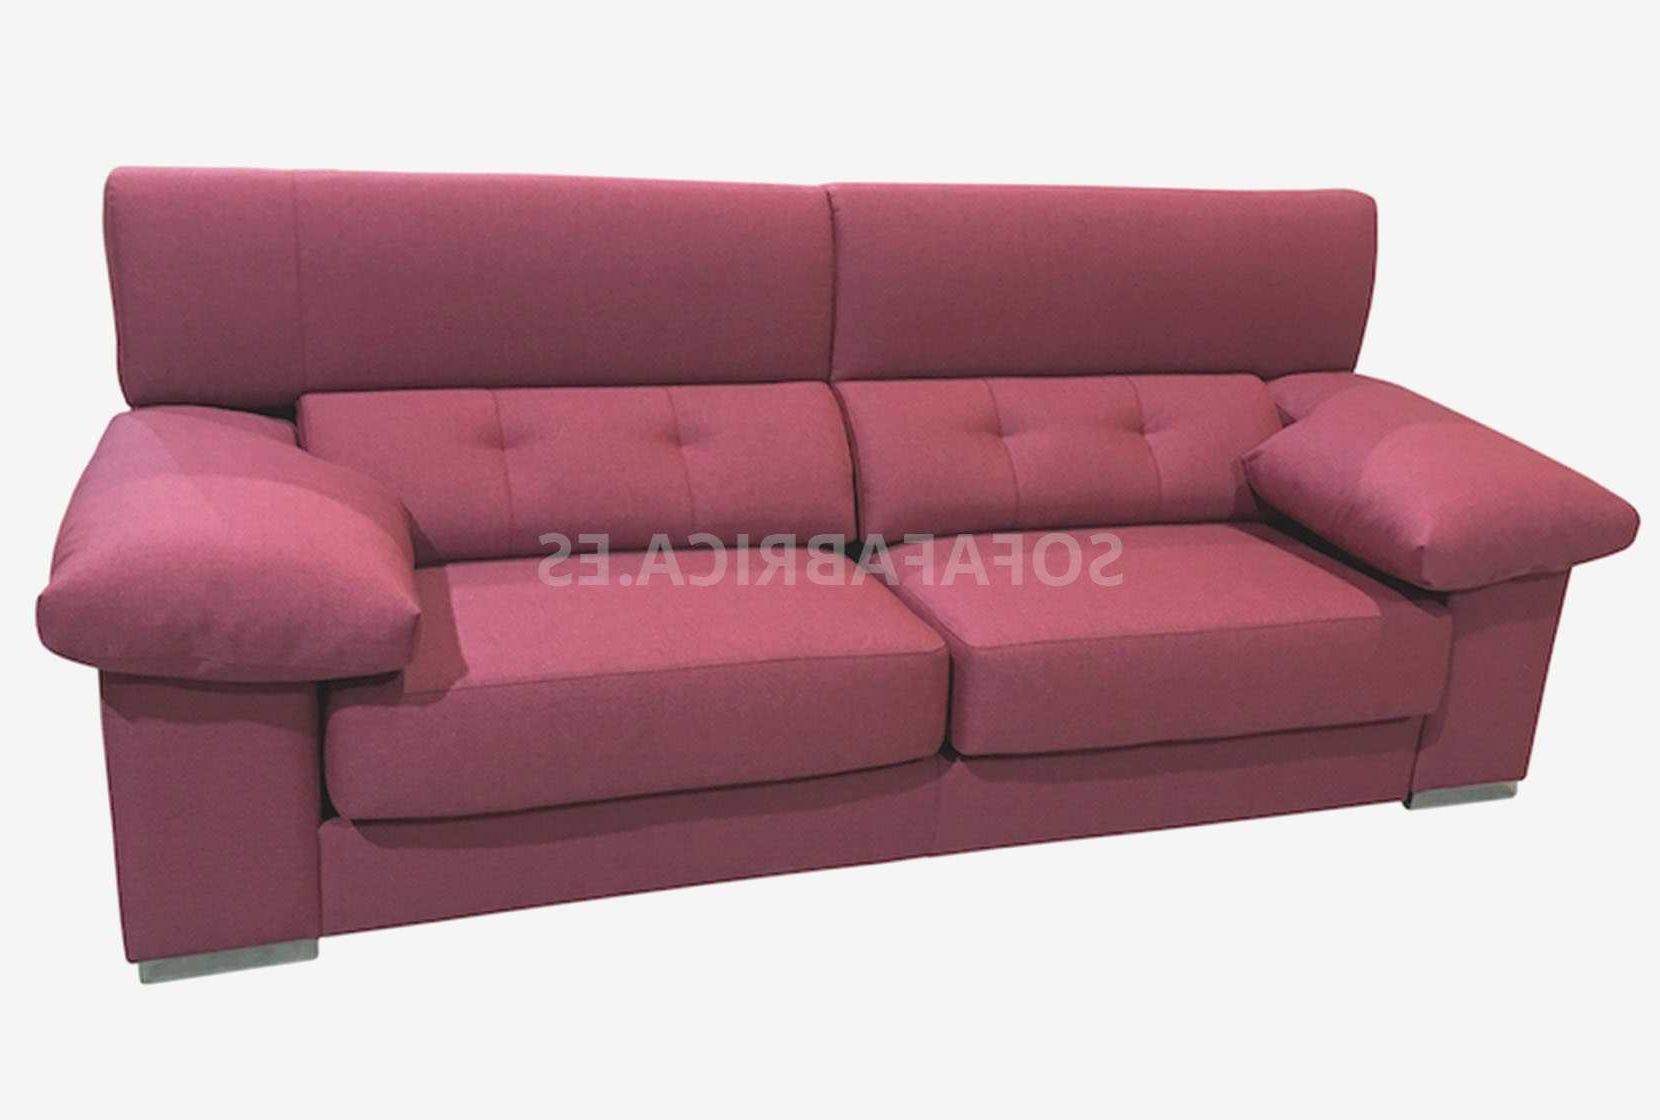 Sillon Cama 1 Plaza Merkamueble Irdz Merkamueble sofas Cama 60 Creaciones Sillon Cama 1 Plaza Merkamueble